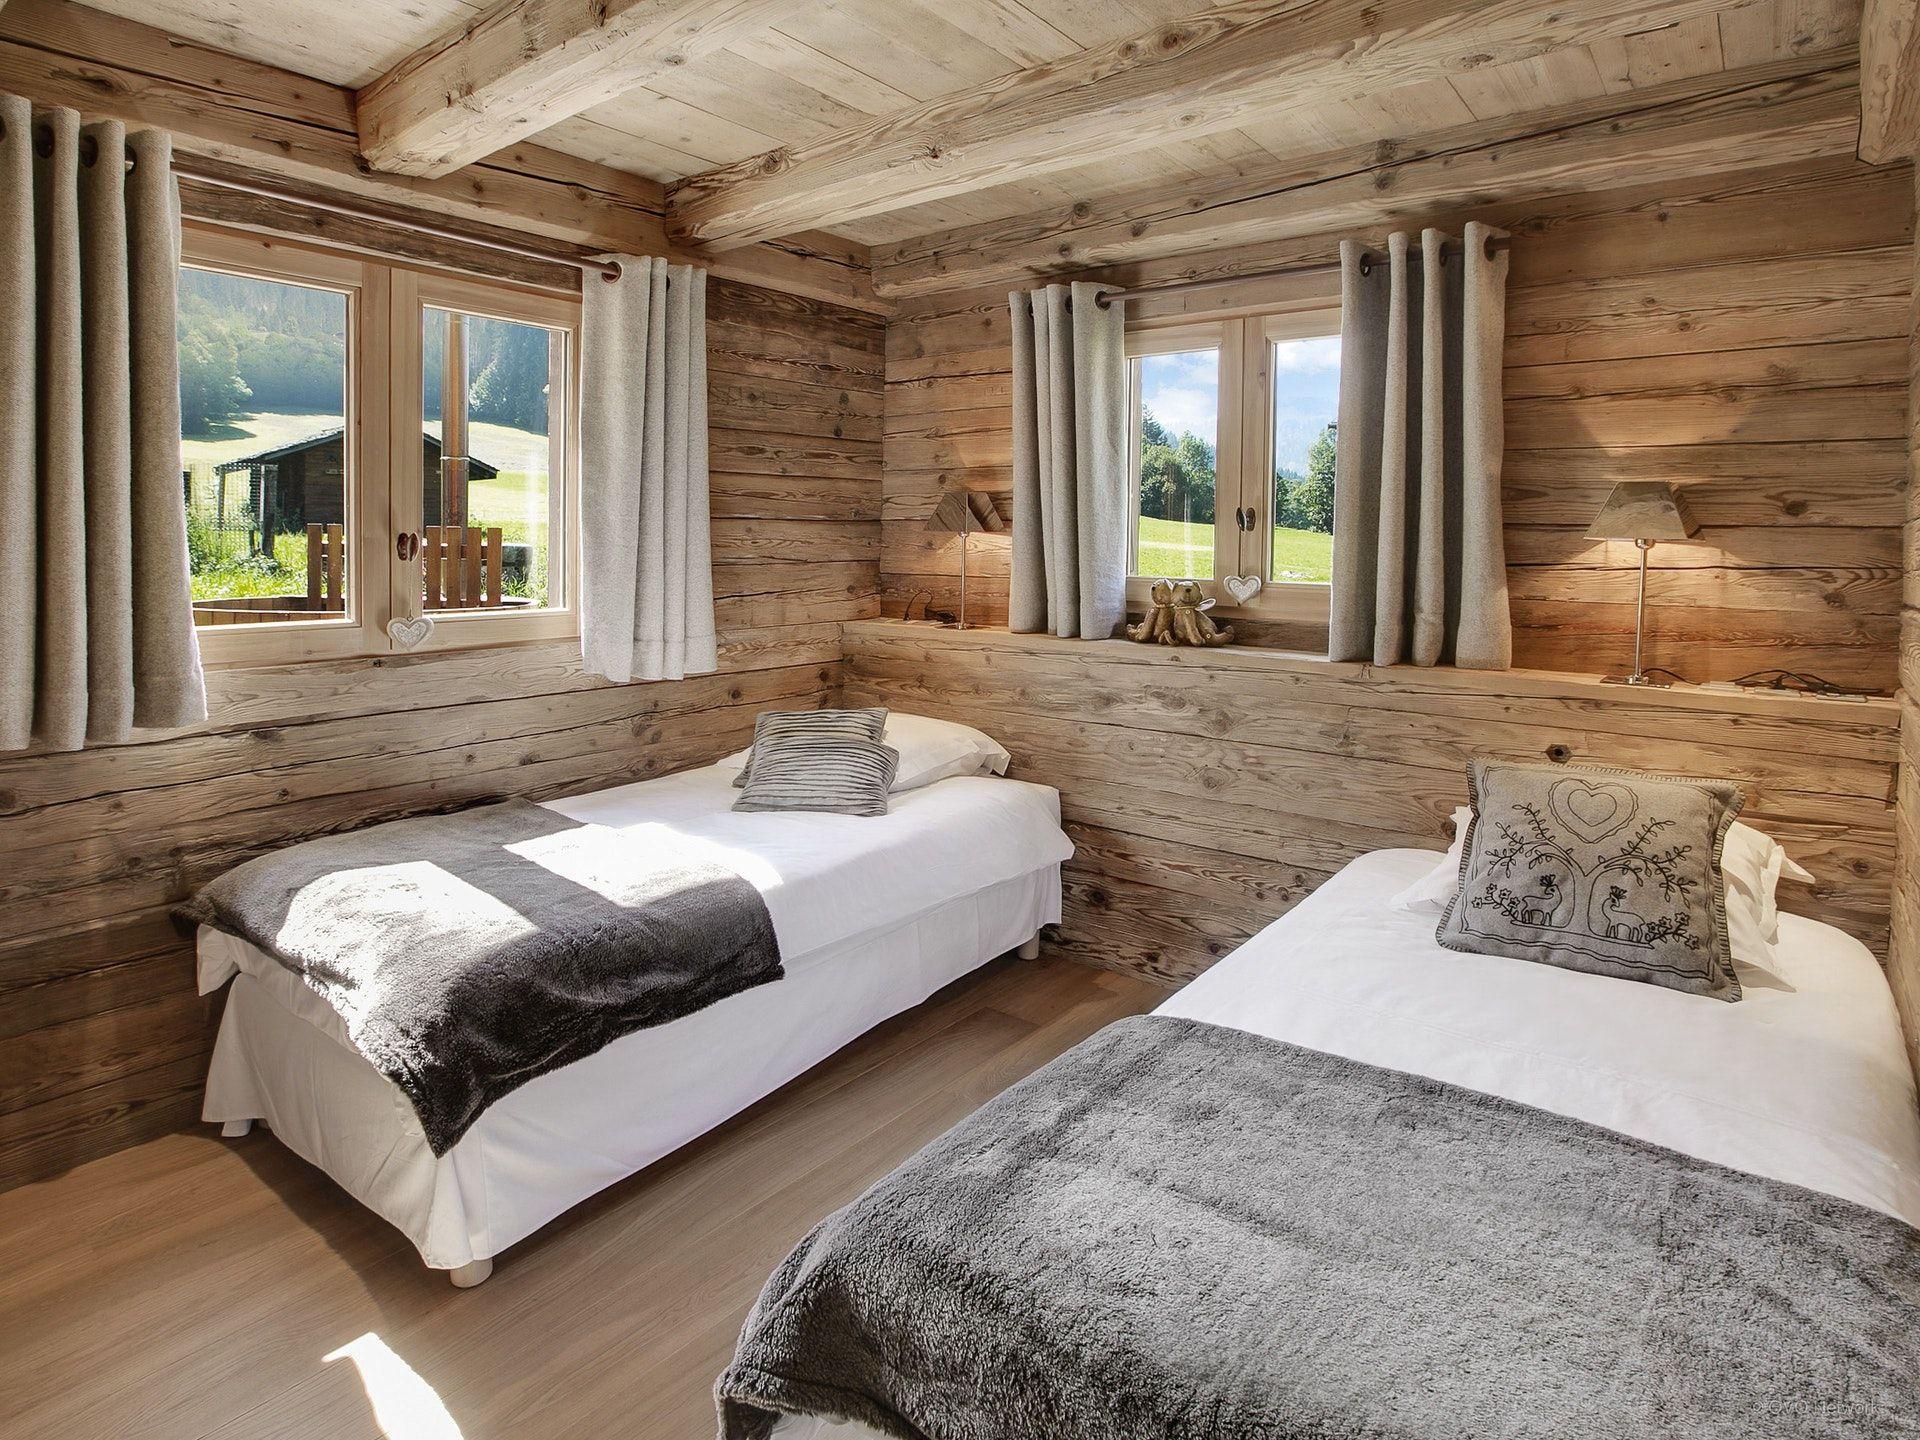 Chalet Patagonia | cesljari | Pinterest | Chalet, Interieur chalet ...